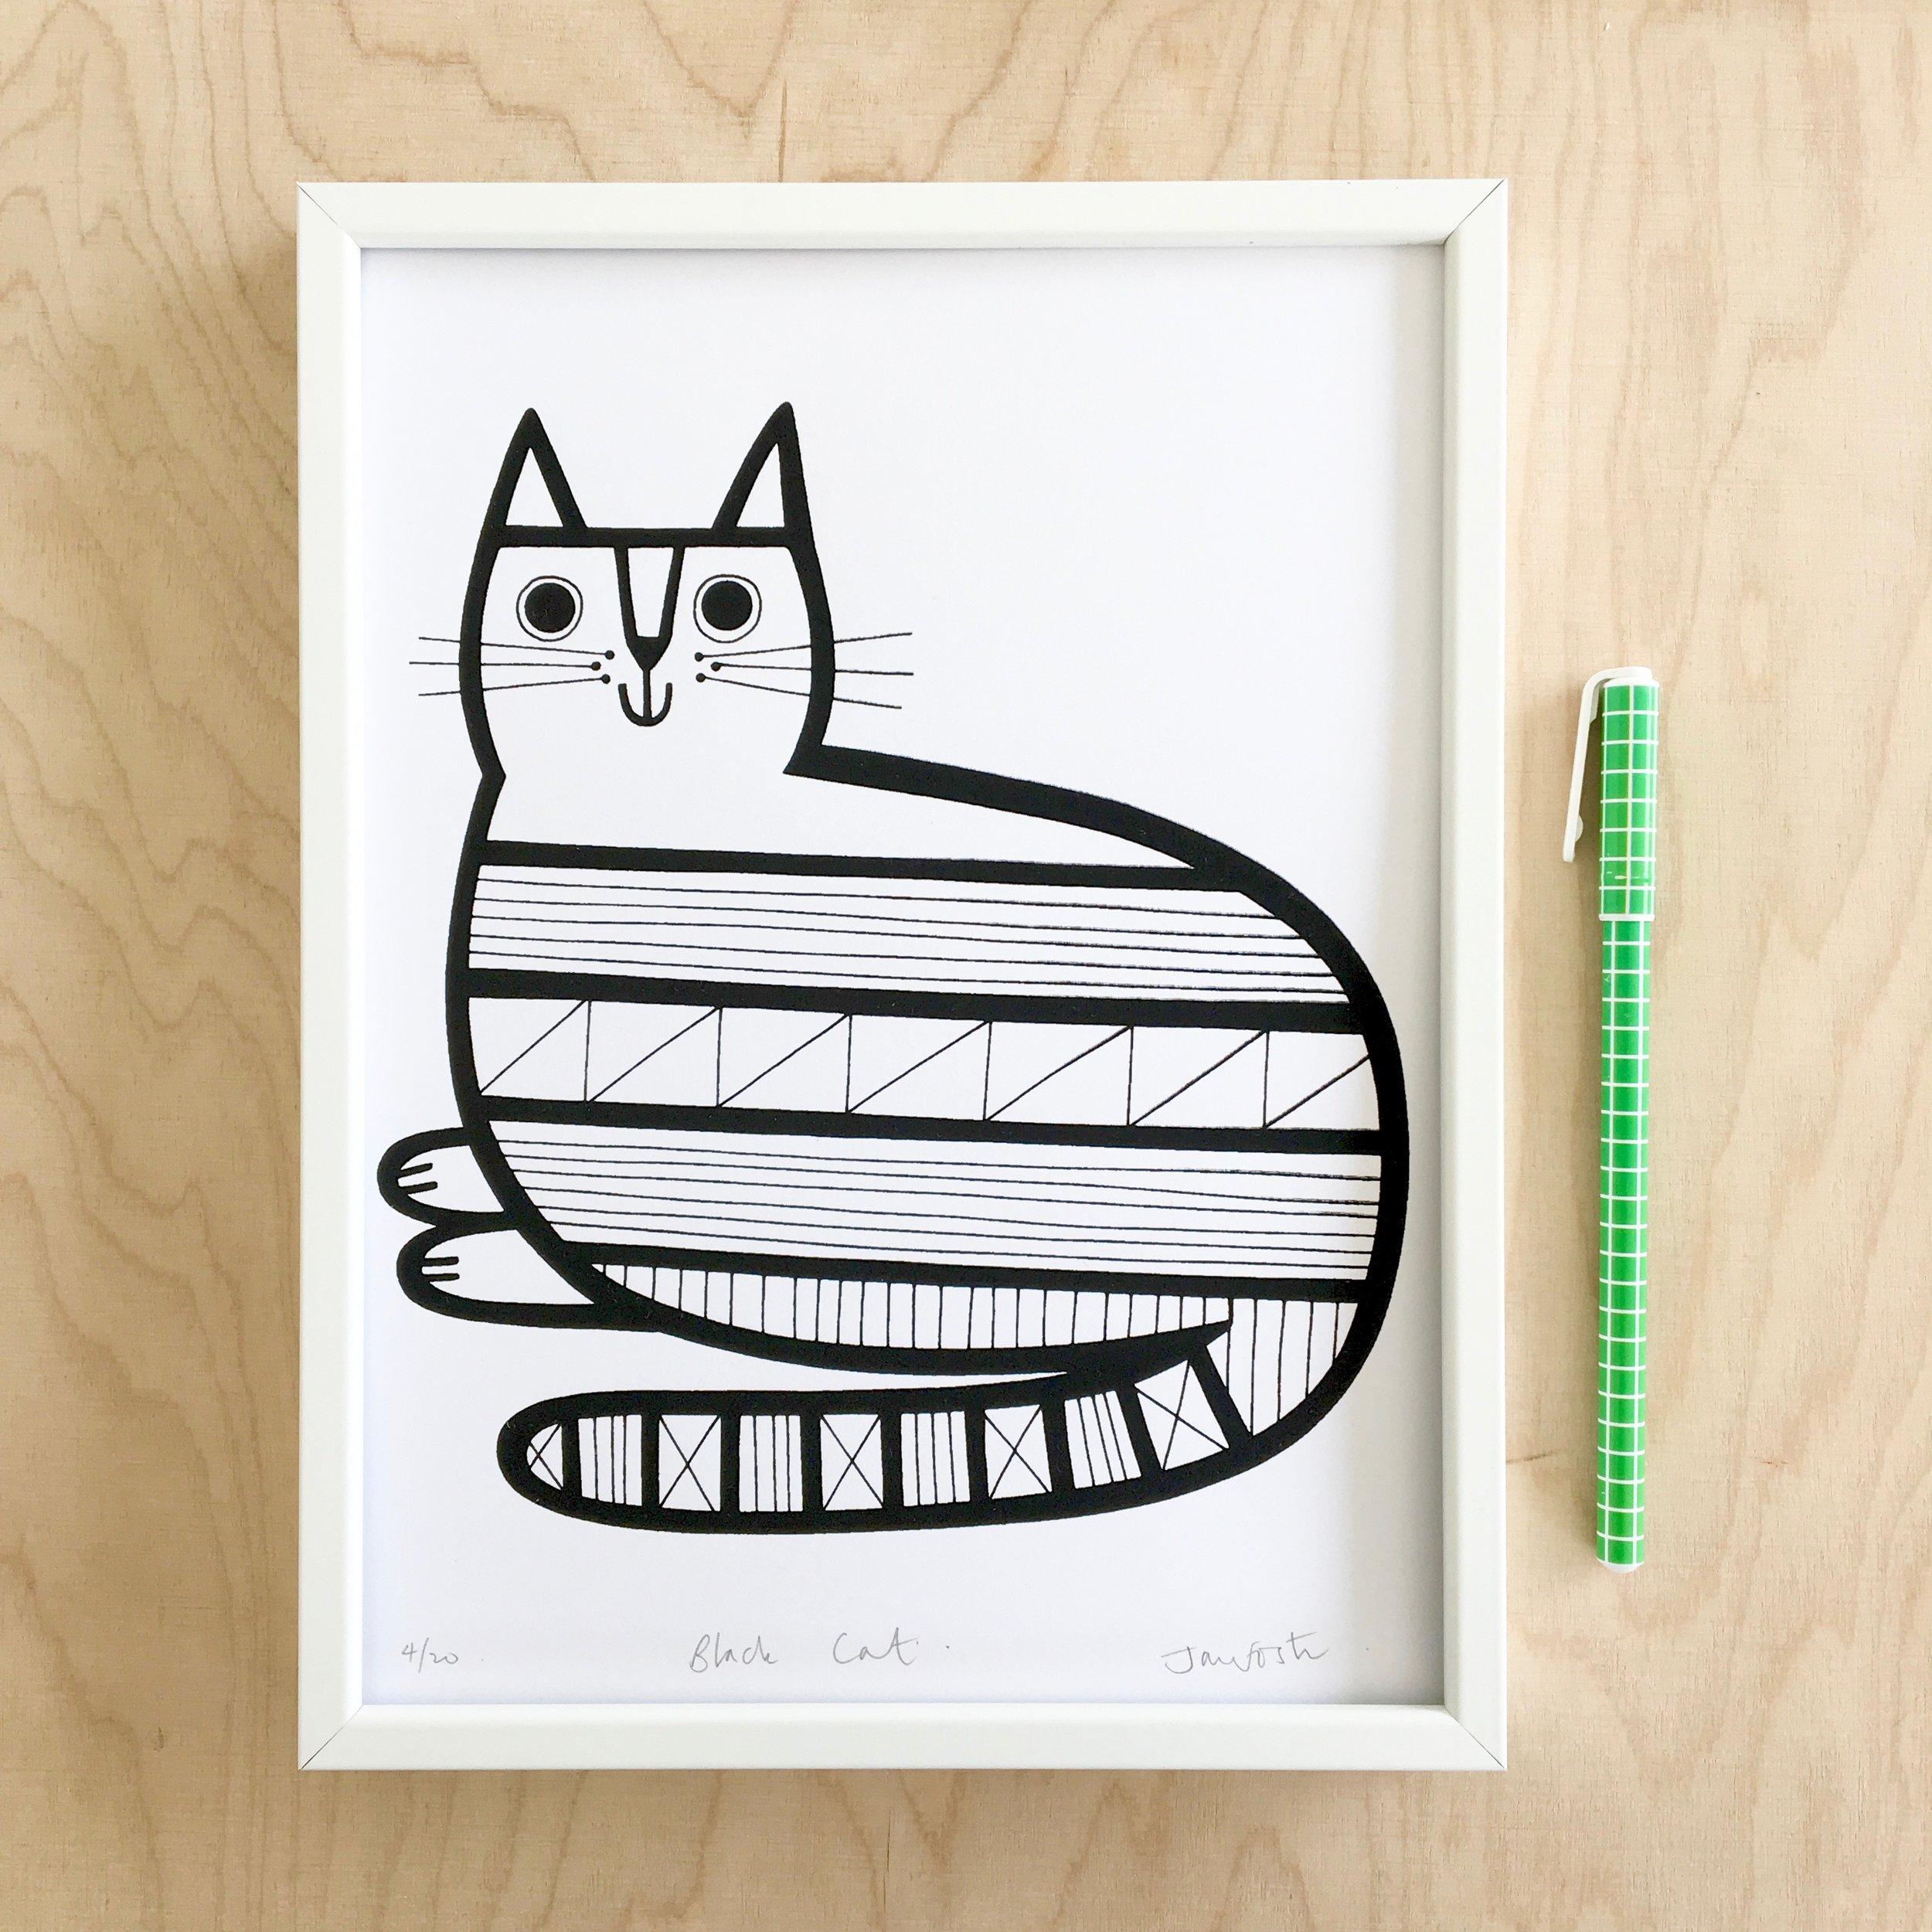 My geometric cat illustration / screen print